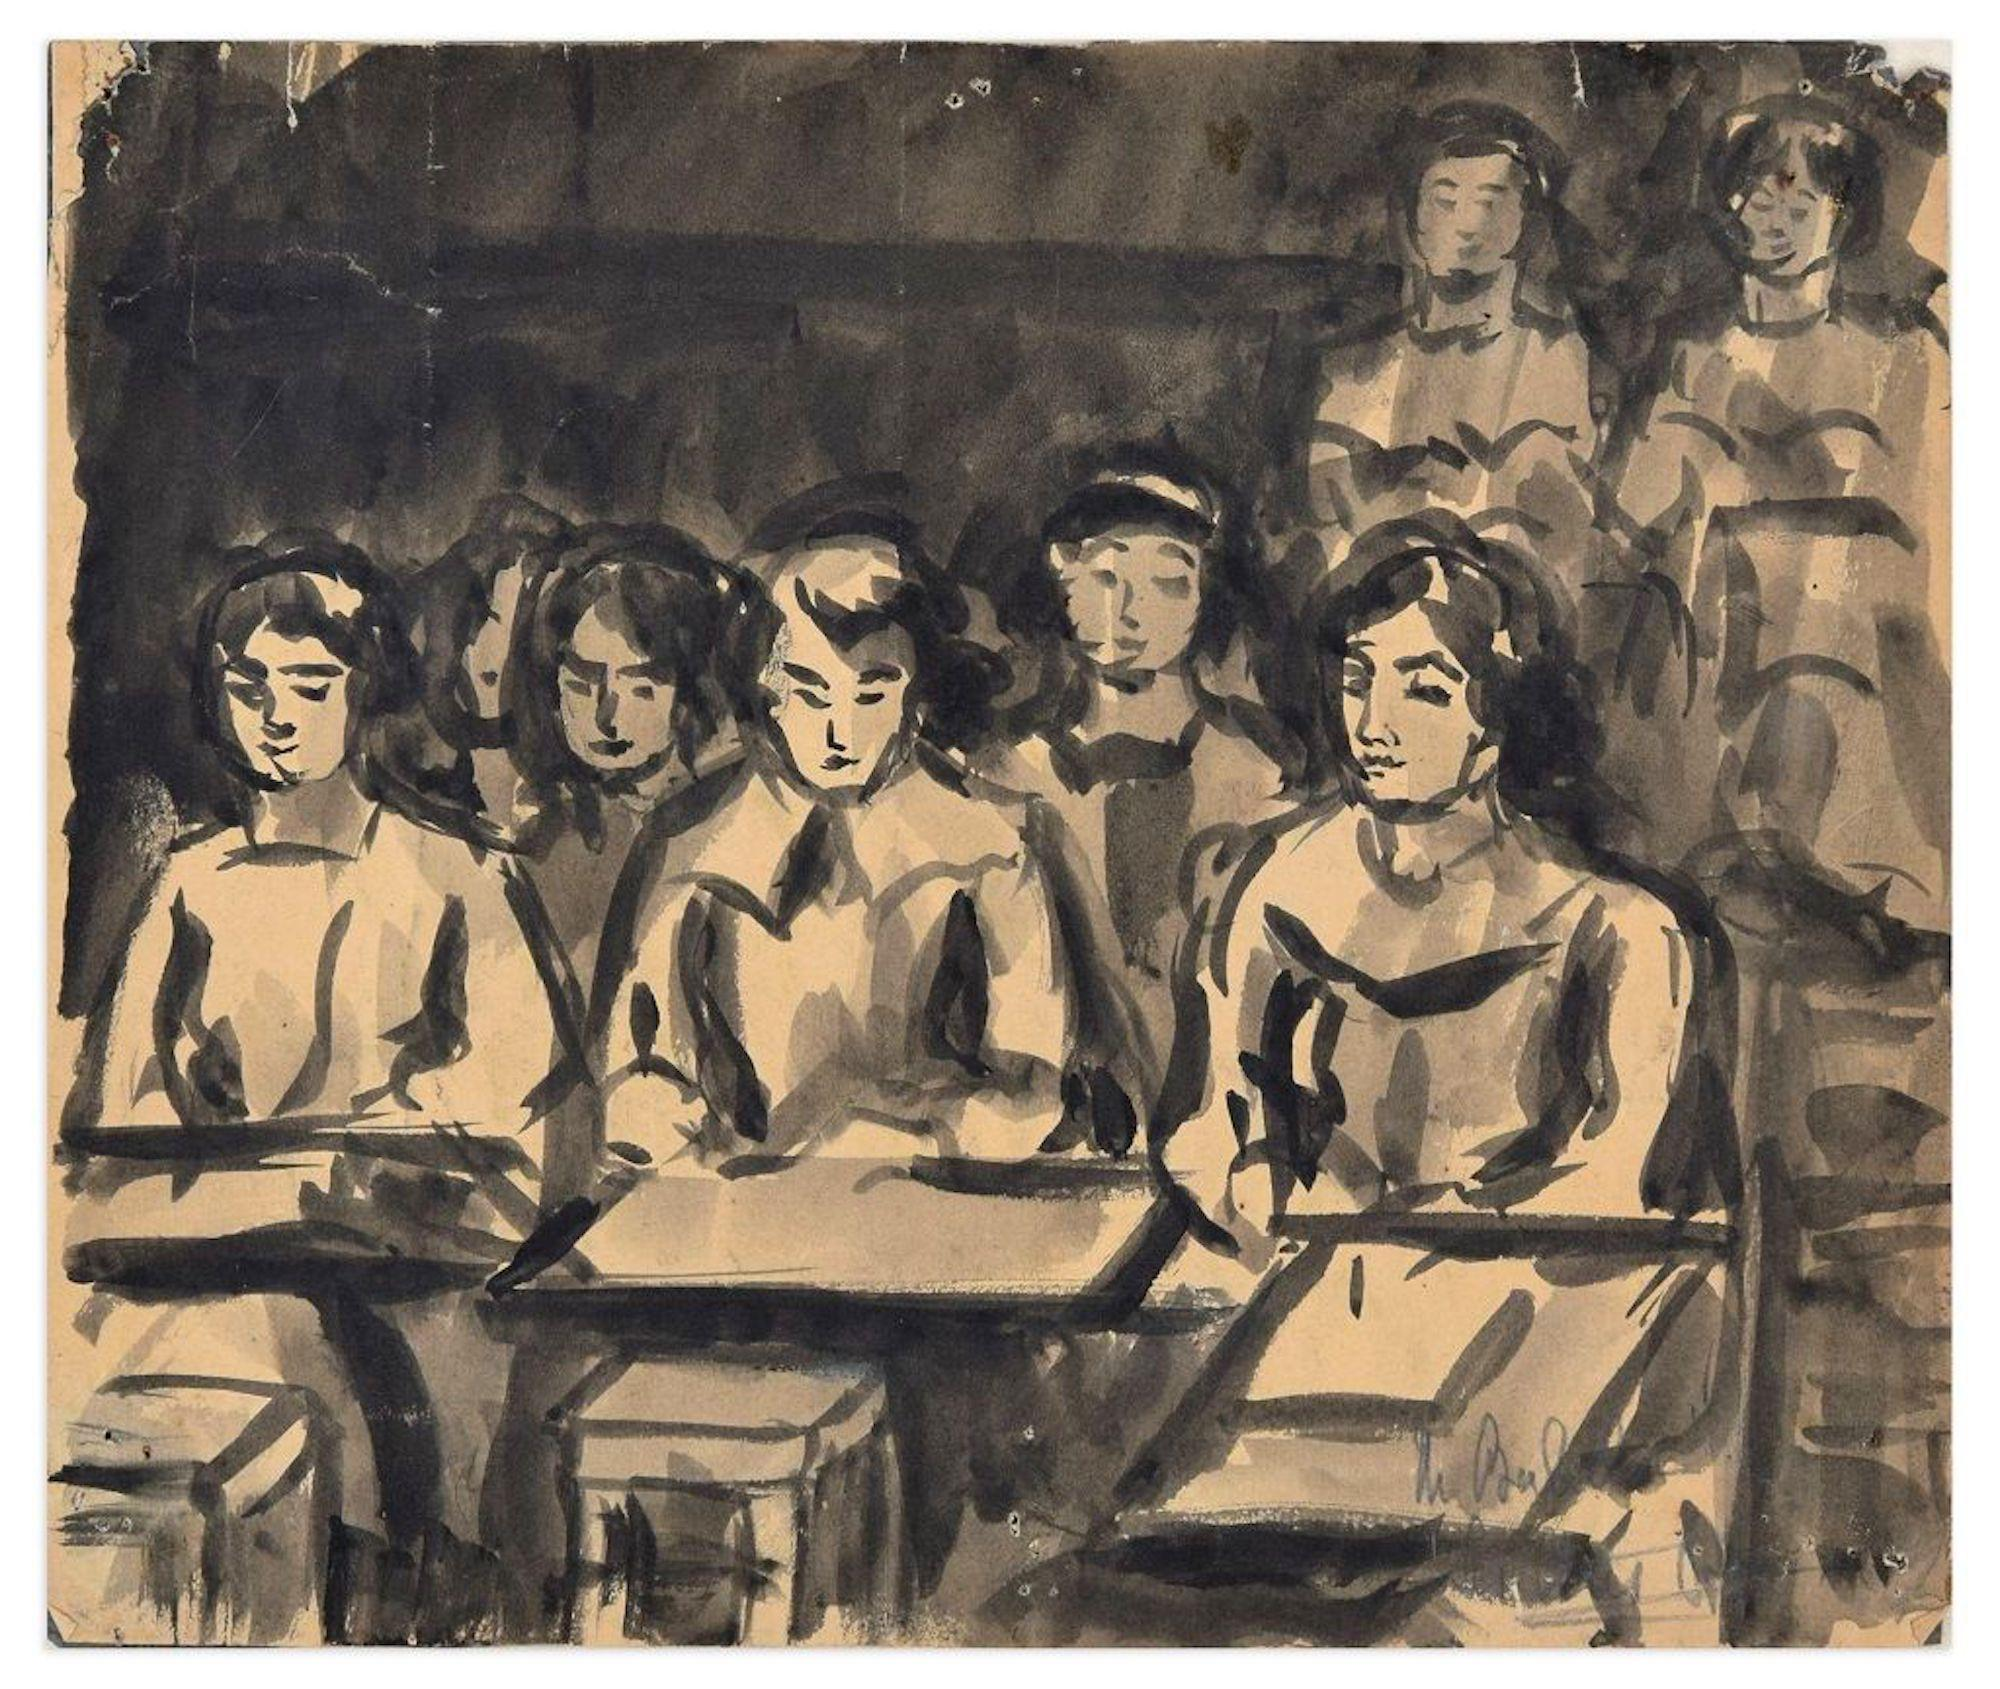 Schoolgirls - Ink and Watercolor Drawing - 1940 ca.